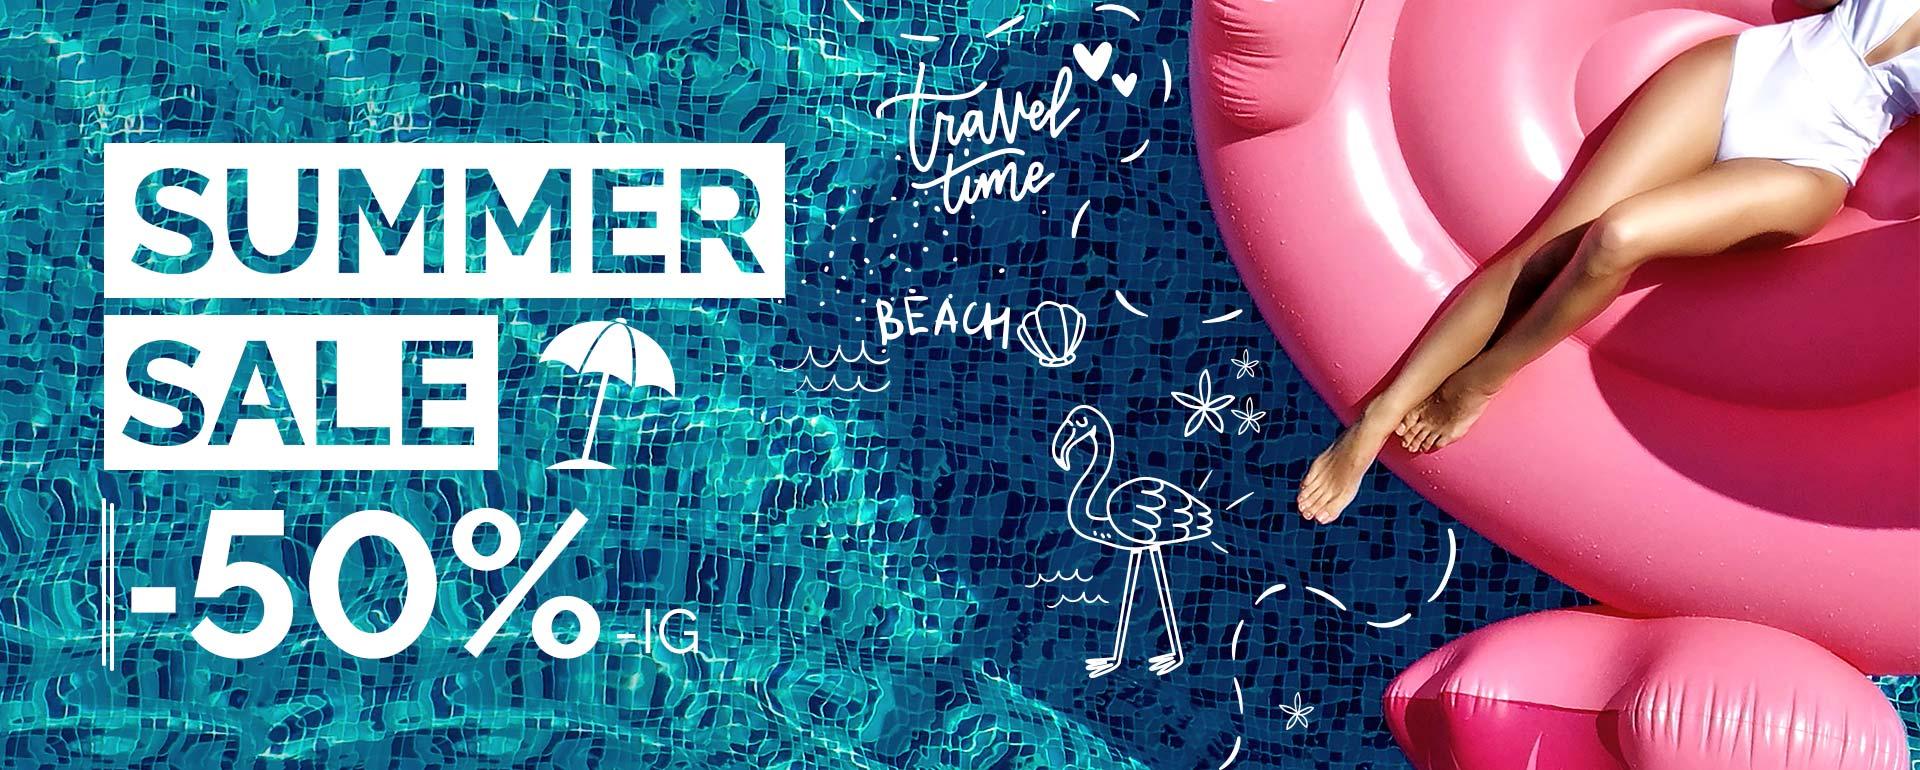 Summer Sale - PUPA Milano